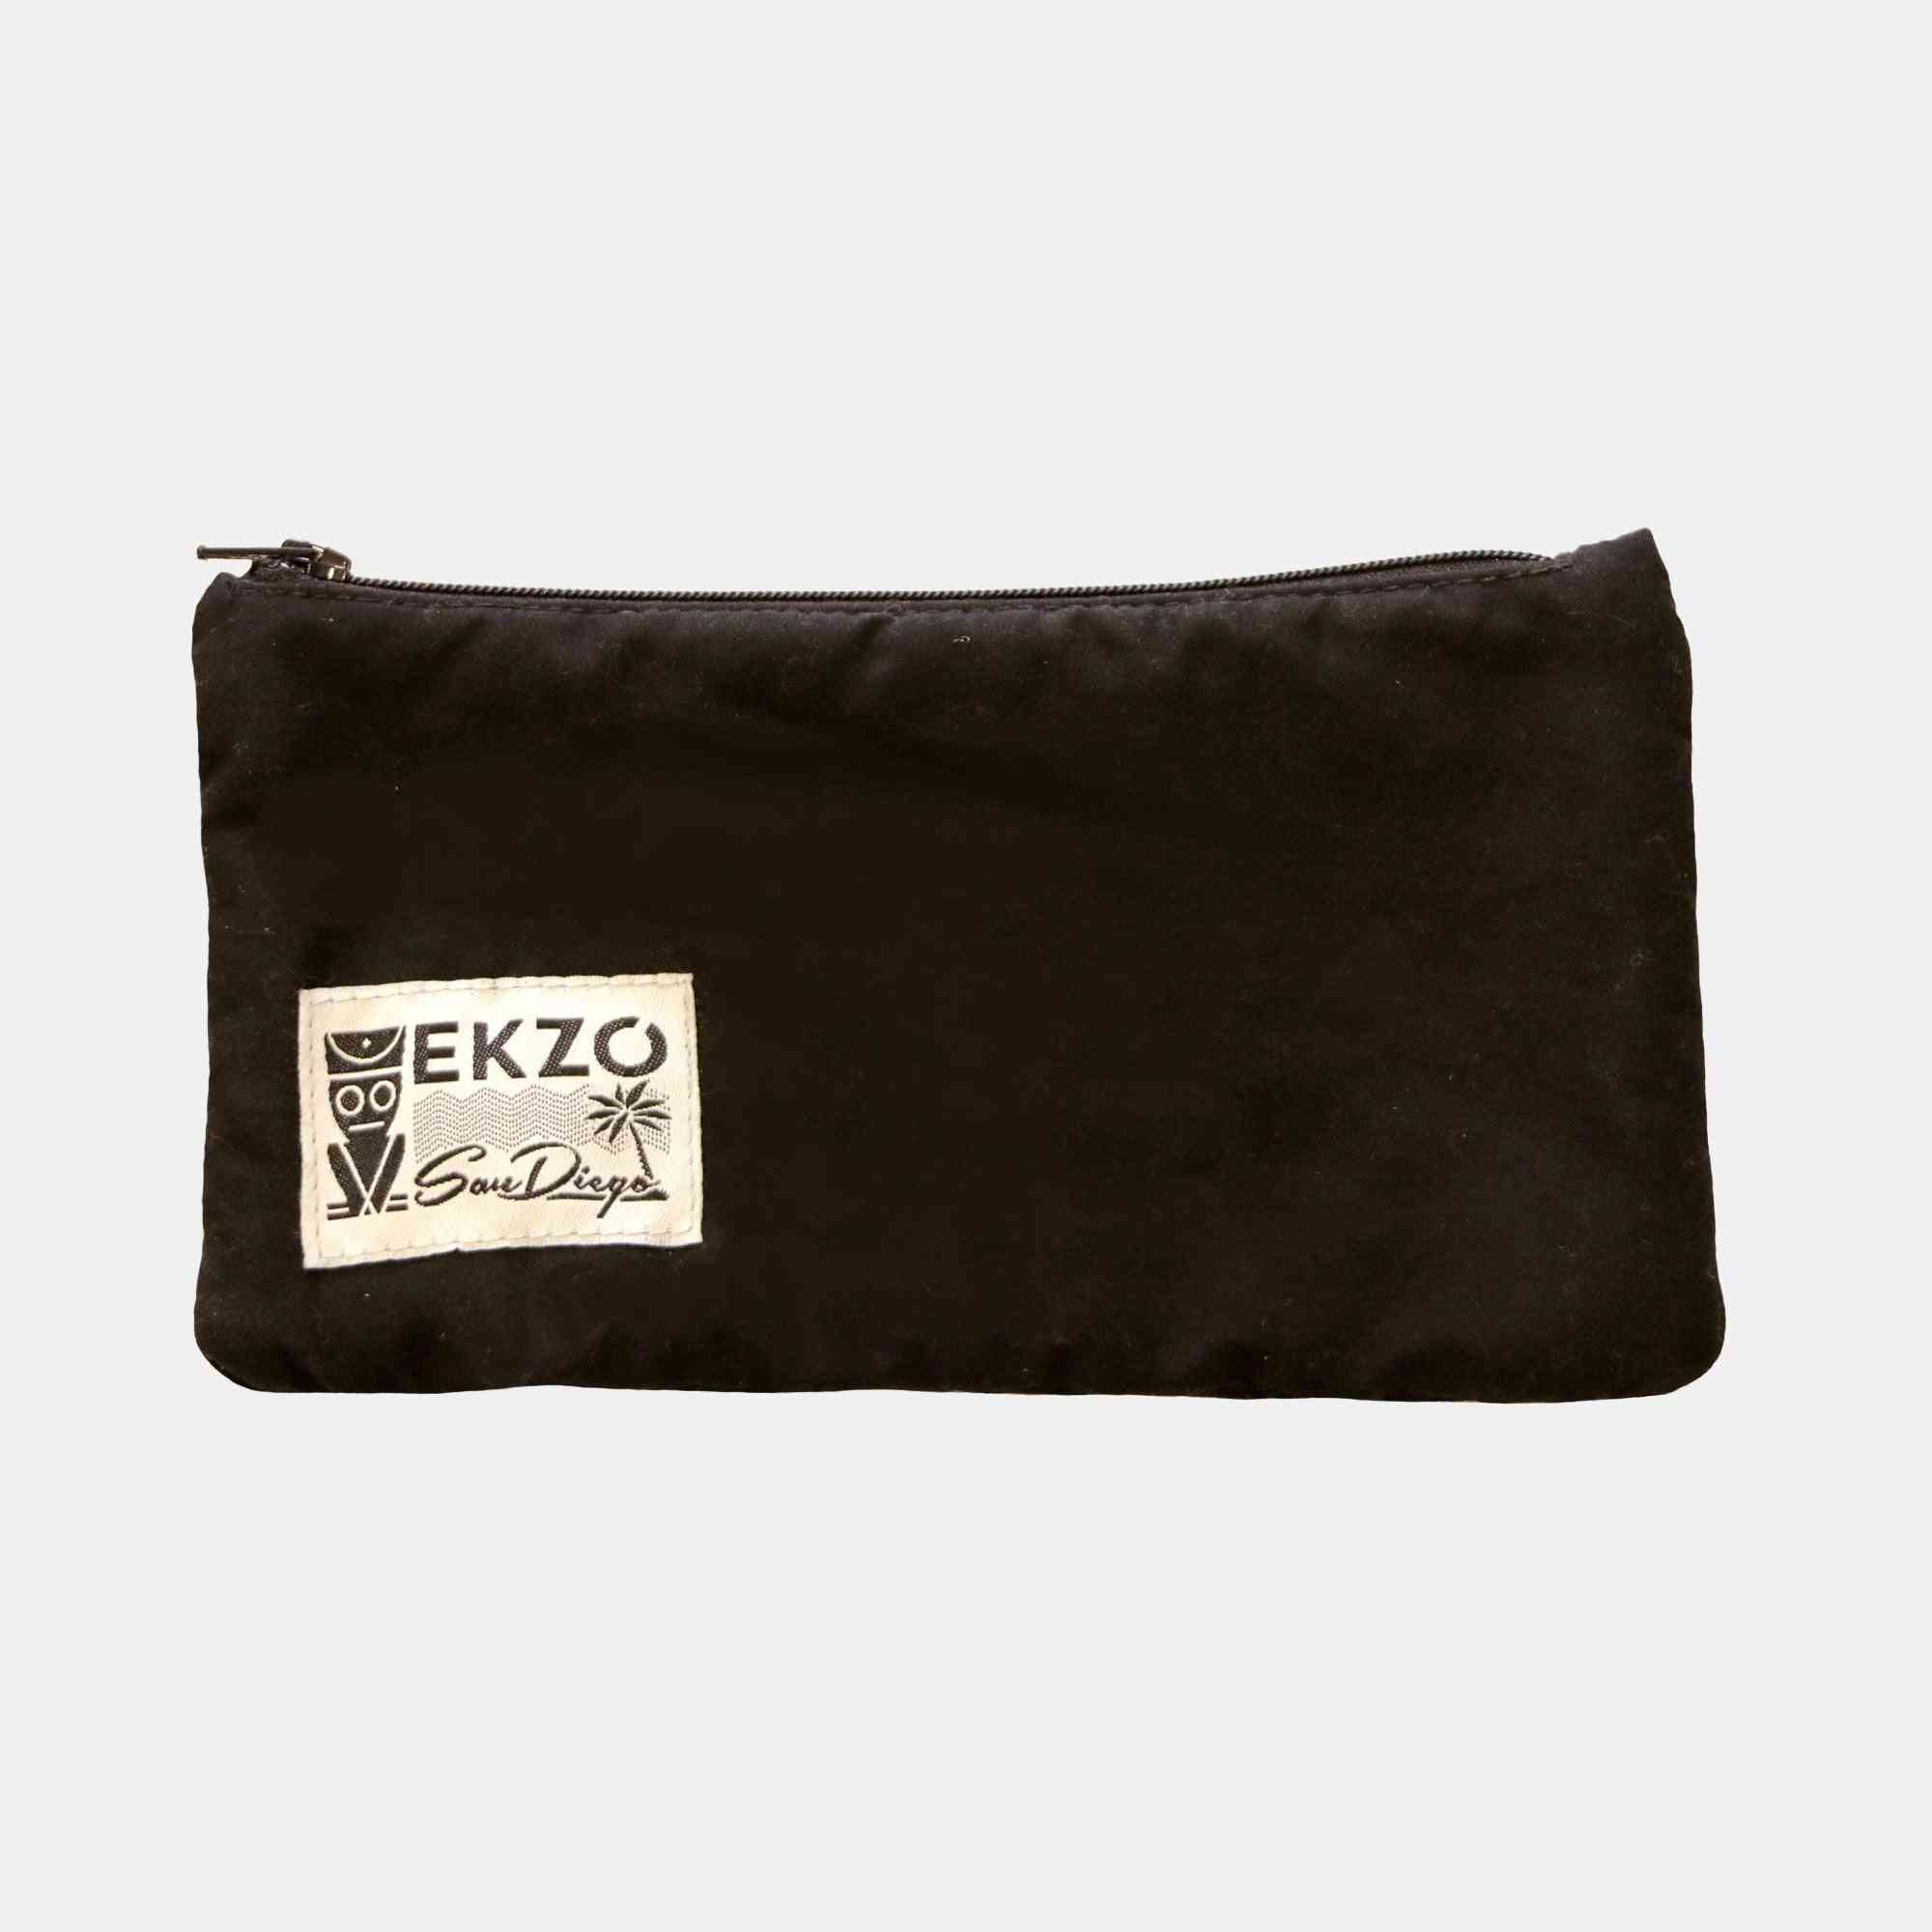 Handcrafted Single Pocket Wallet